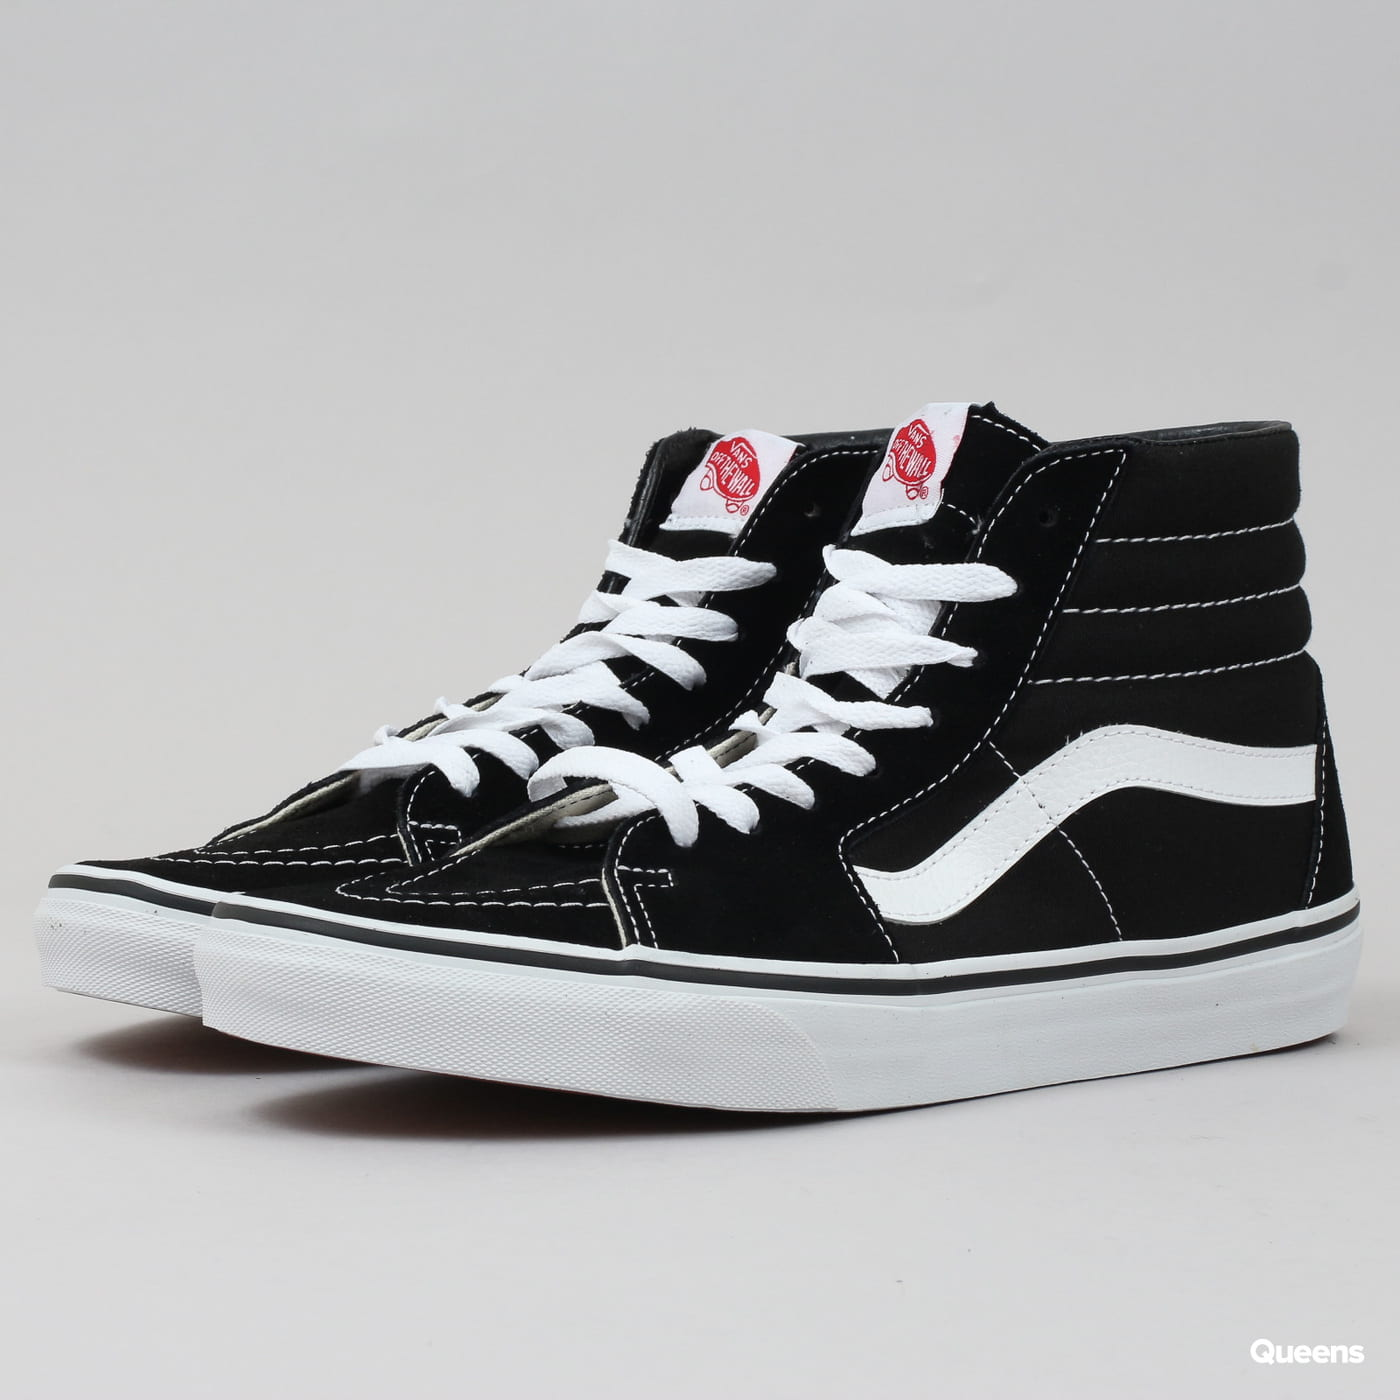 Vans SK8 - Hi black / black / white